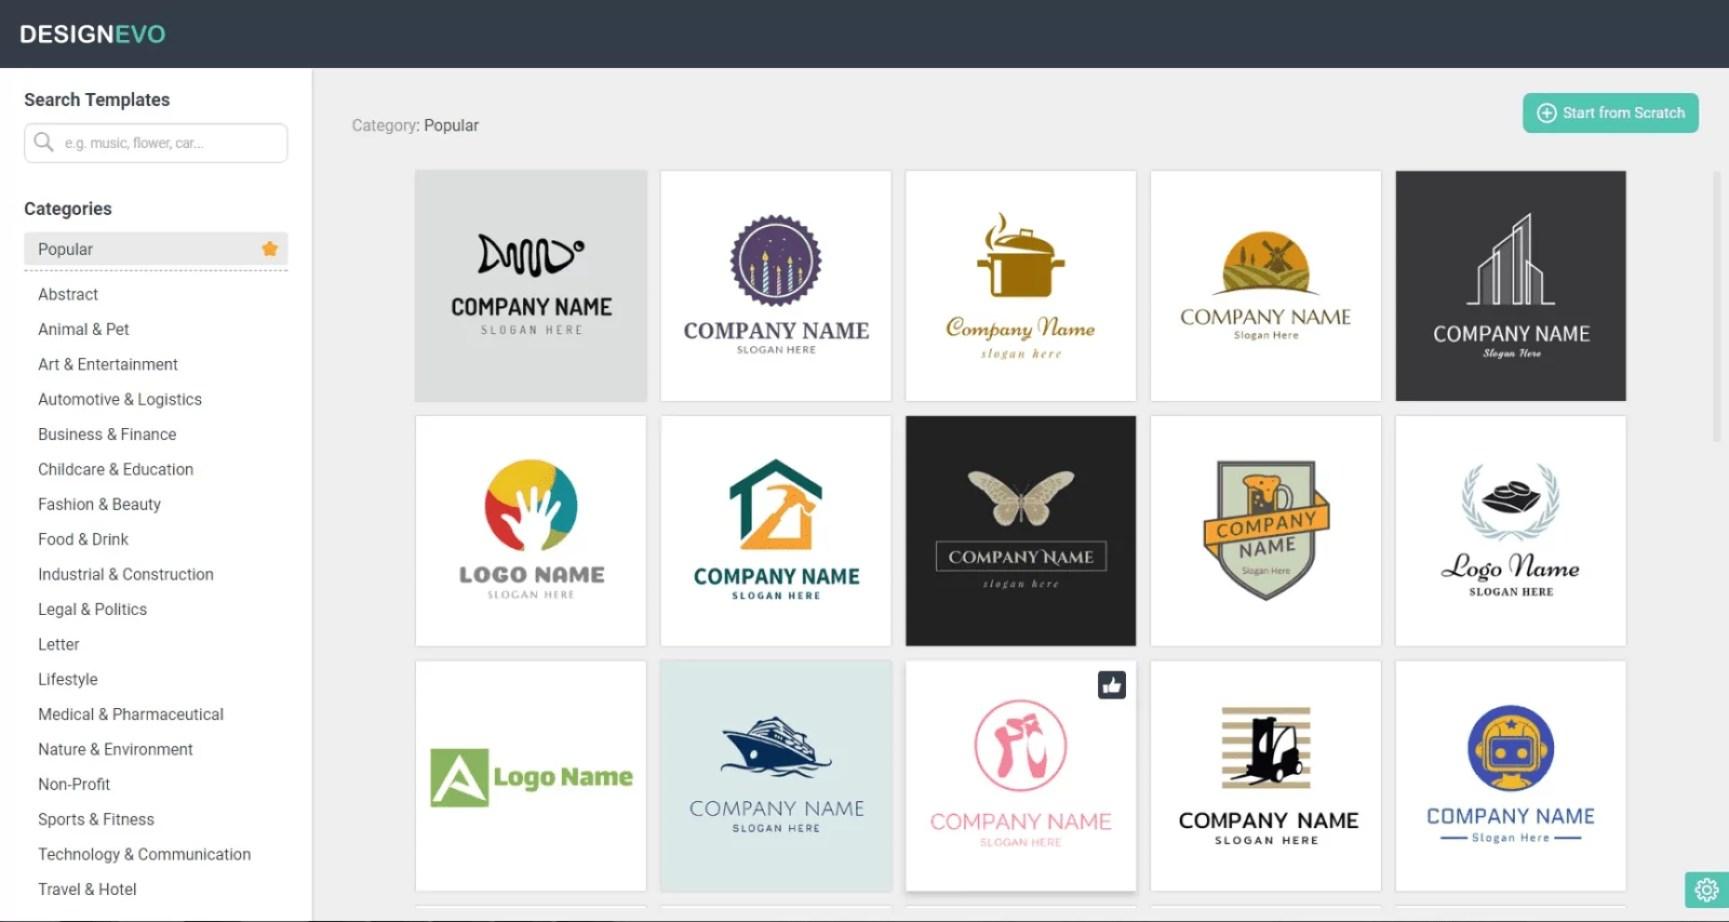 word image - Make Professional Logos Online with DesignEvo Logo Maker